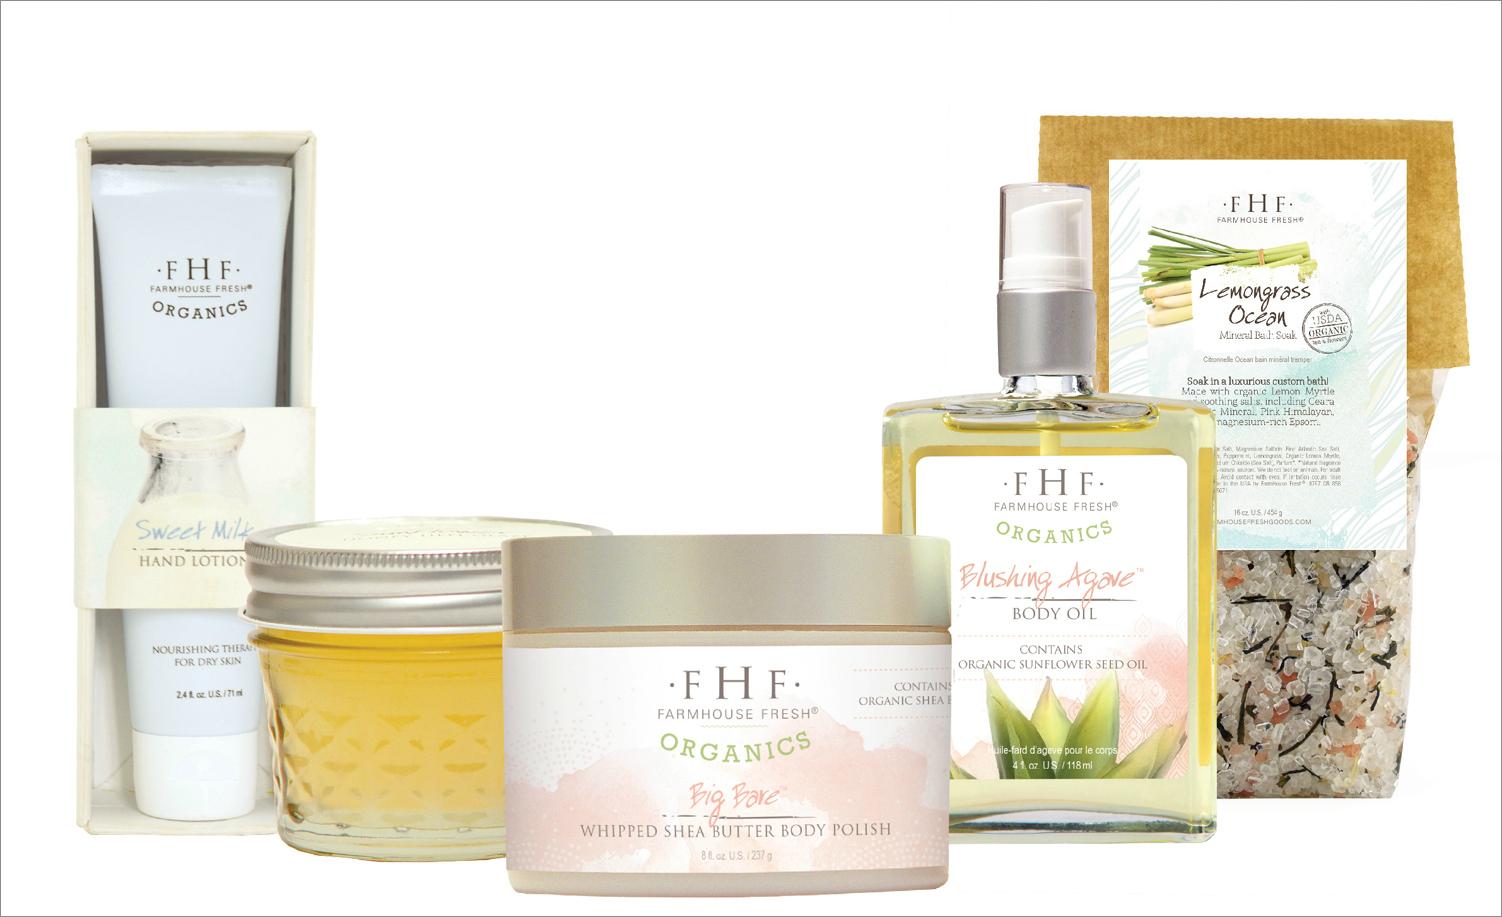 FarmHouse Fresh organics beauty products summer natural fresh